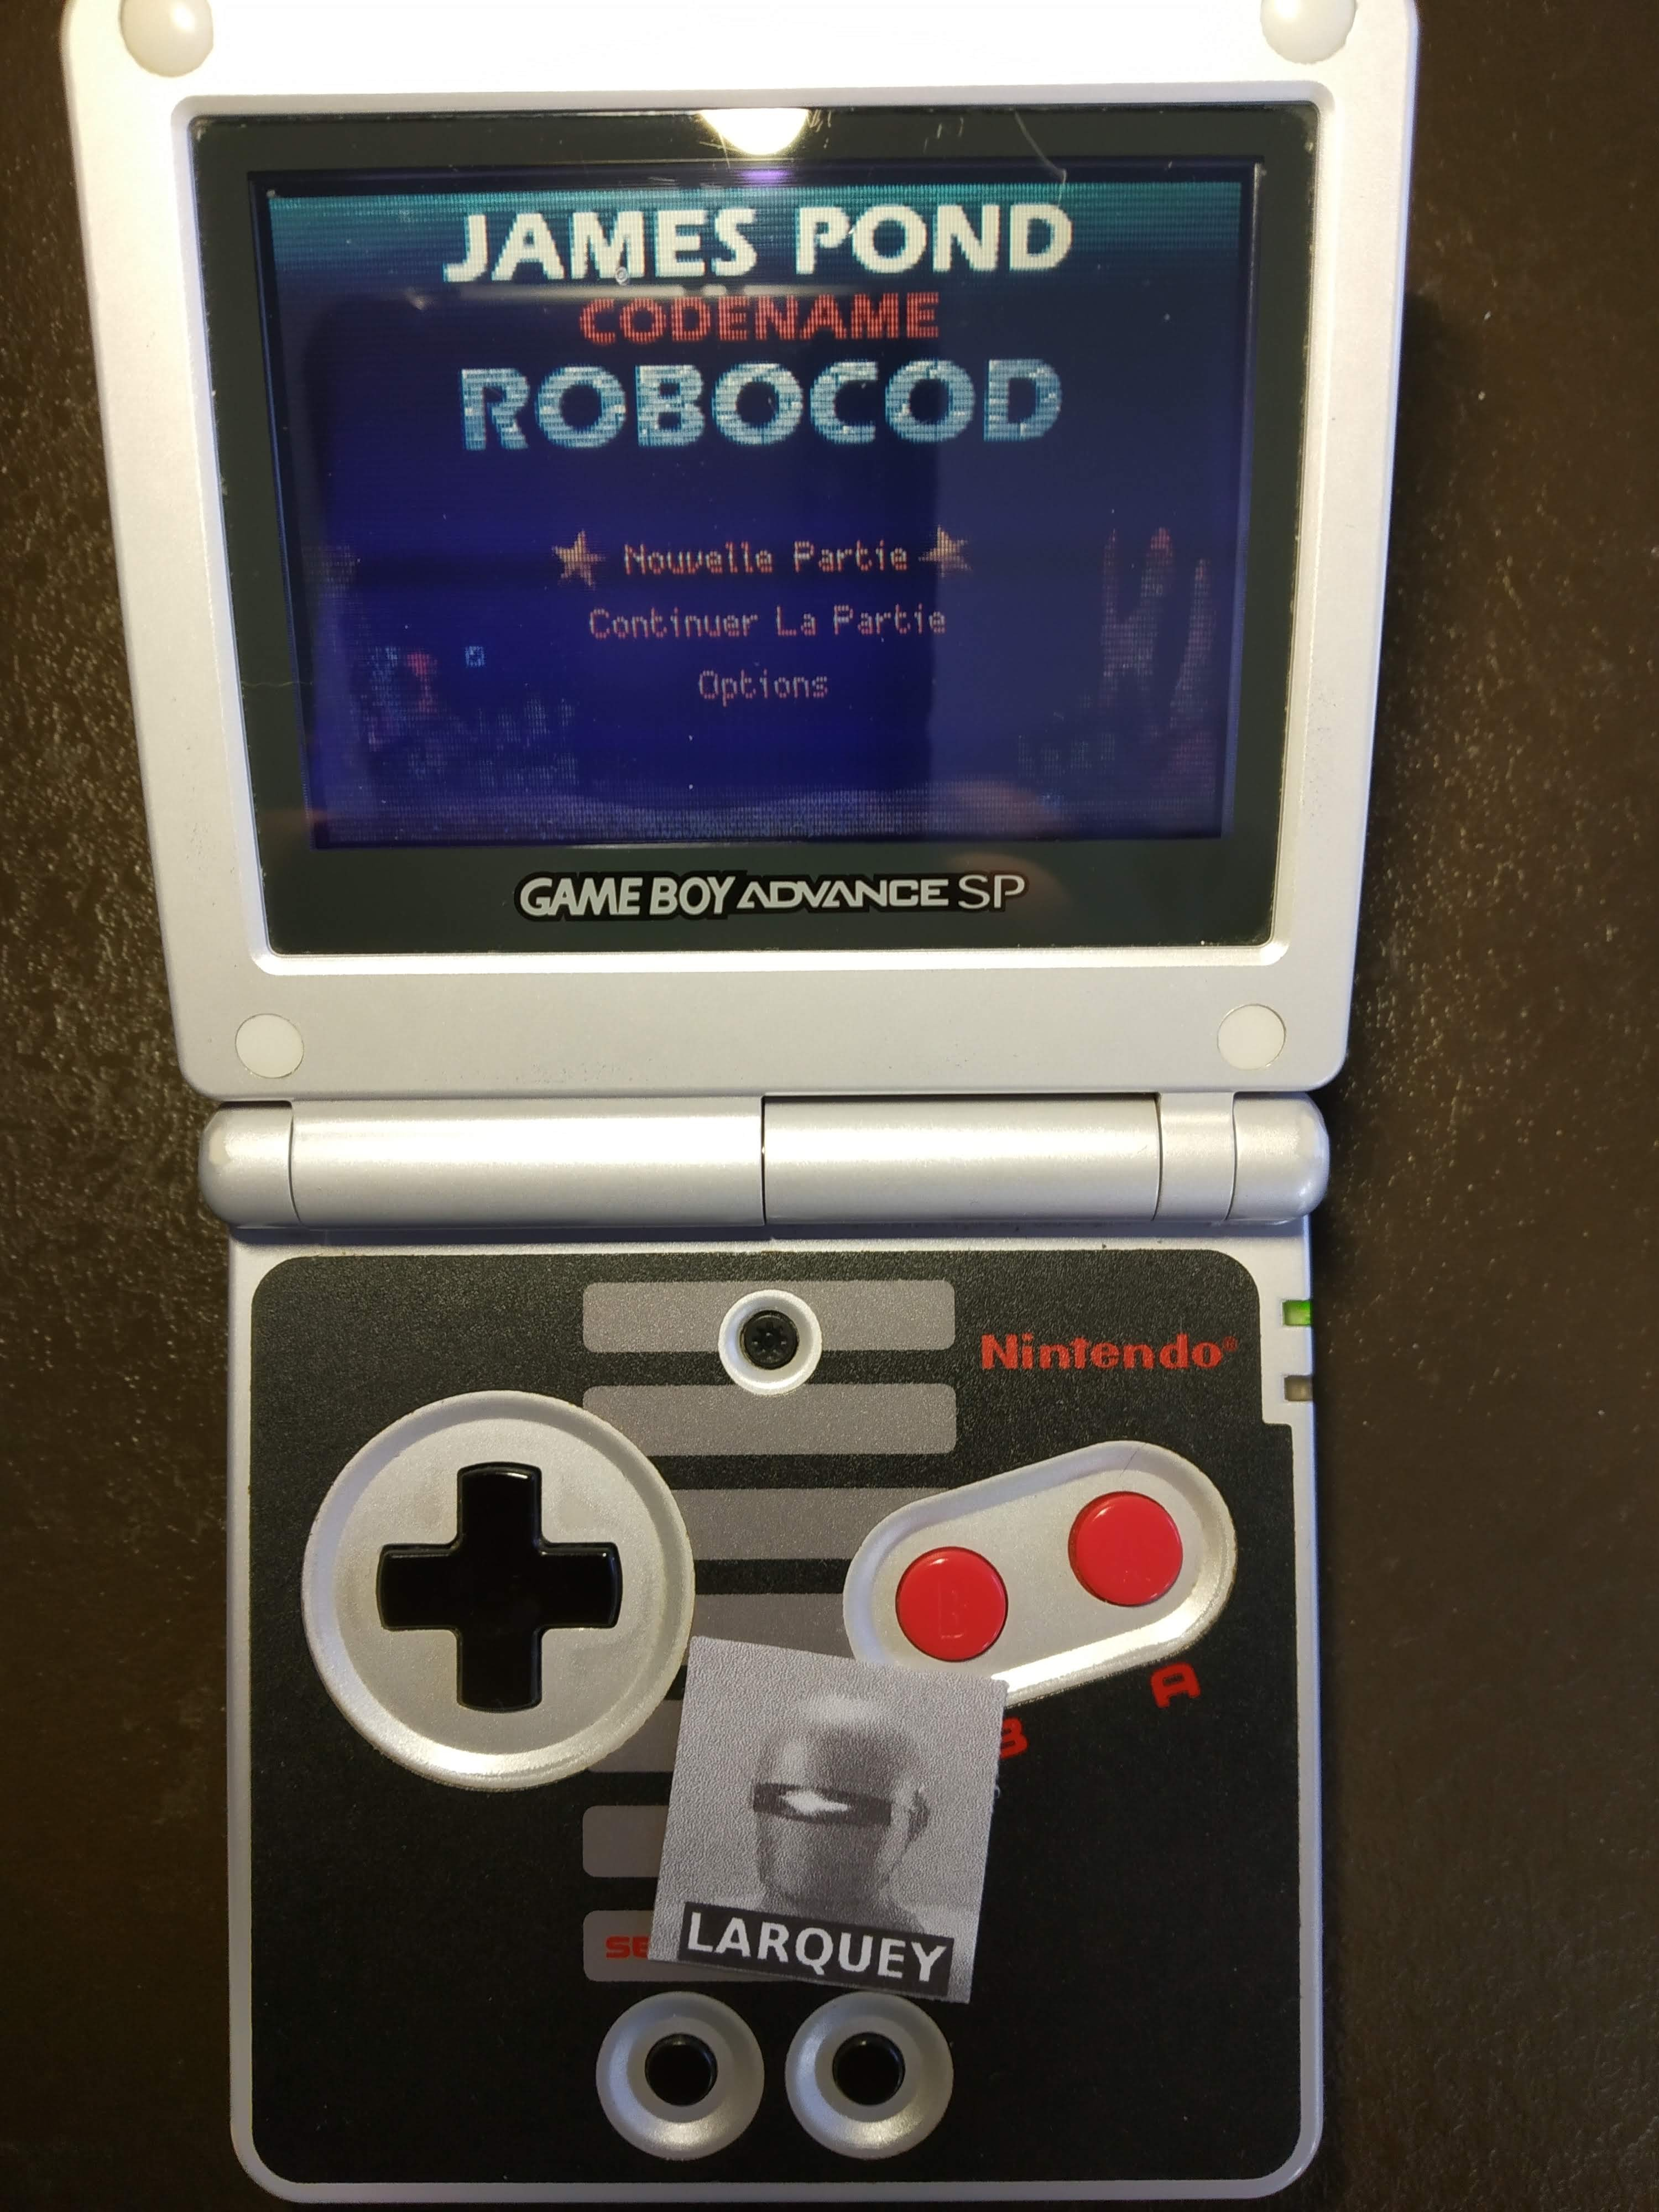 Larquey: James Pond 2: Codename RoboCod (GBA) 285,700 points on 2020-01-02 05:15:36